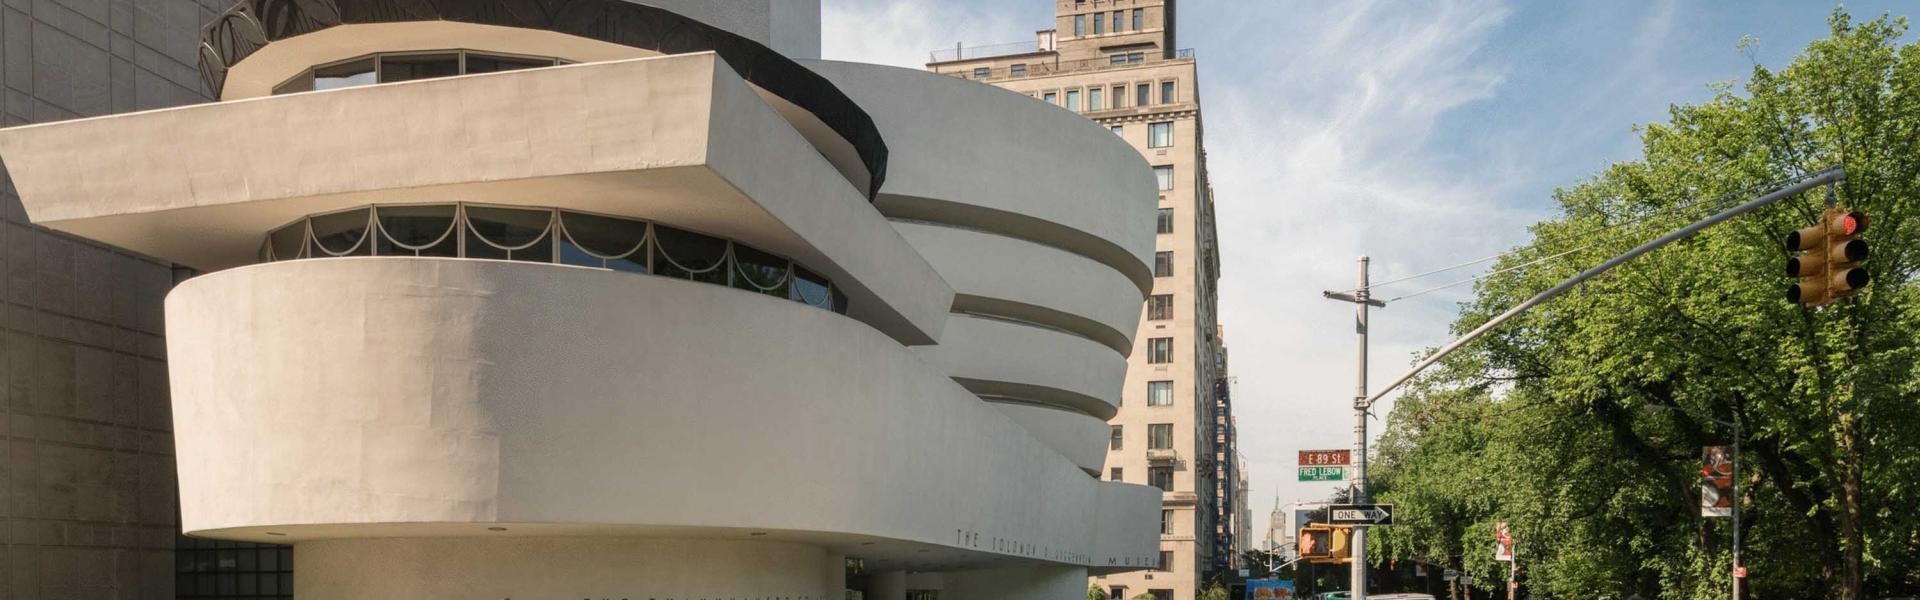 Guggenheim Museum, Upper East Side, Manhattan, NYC, photo David Heald Copyright Solomon R Guggenheim Foundation